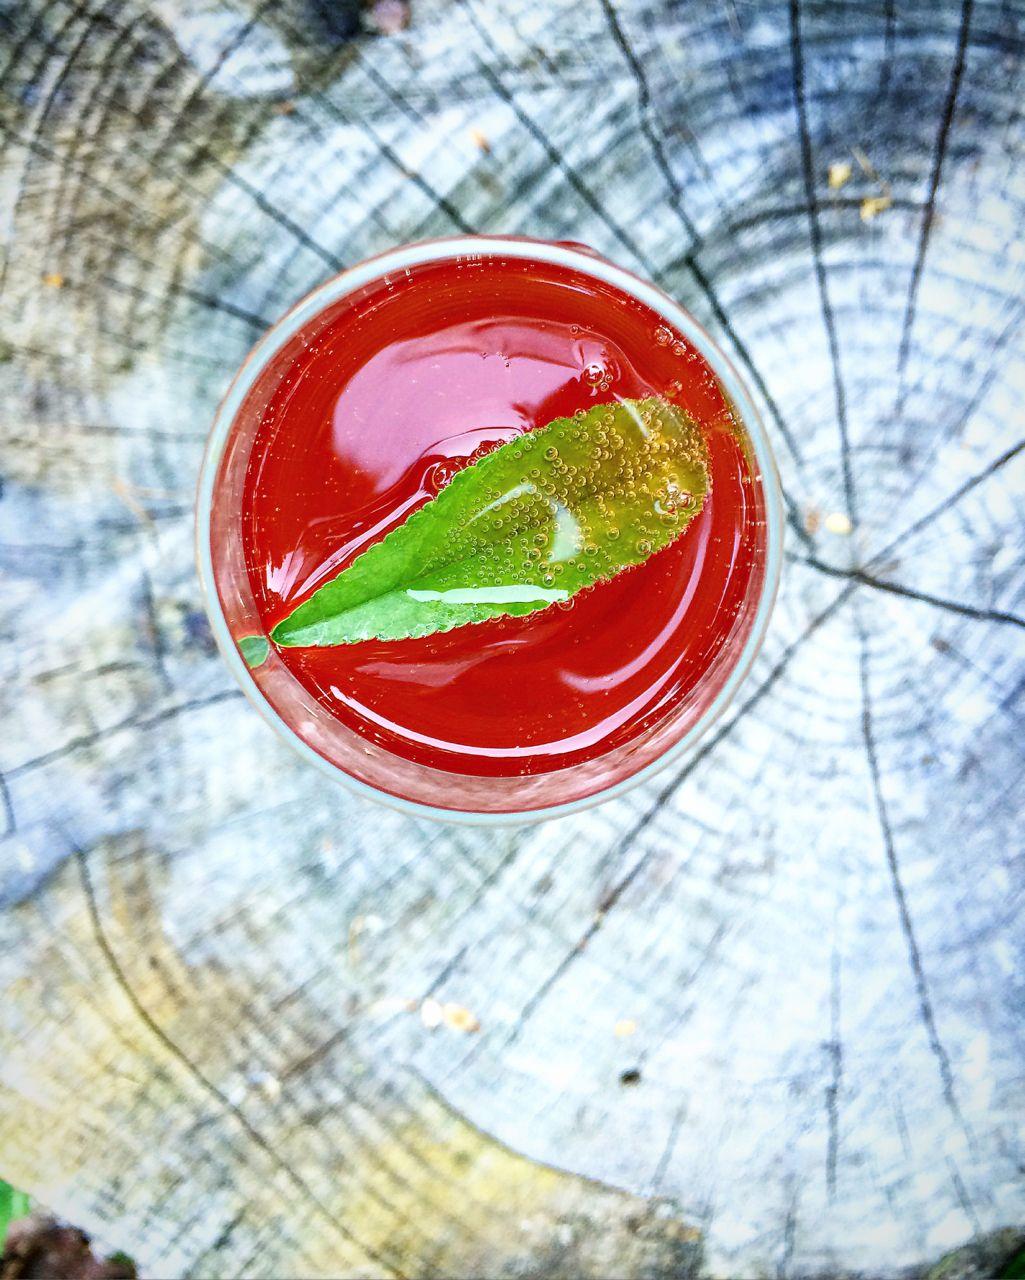 Easy Rhubarb Infused Vodka Recipe And A Refreshing Rhubarb